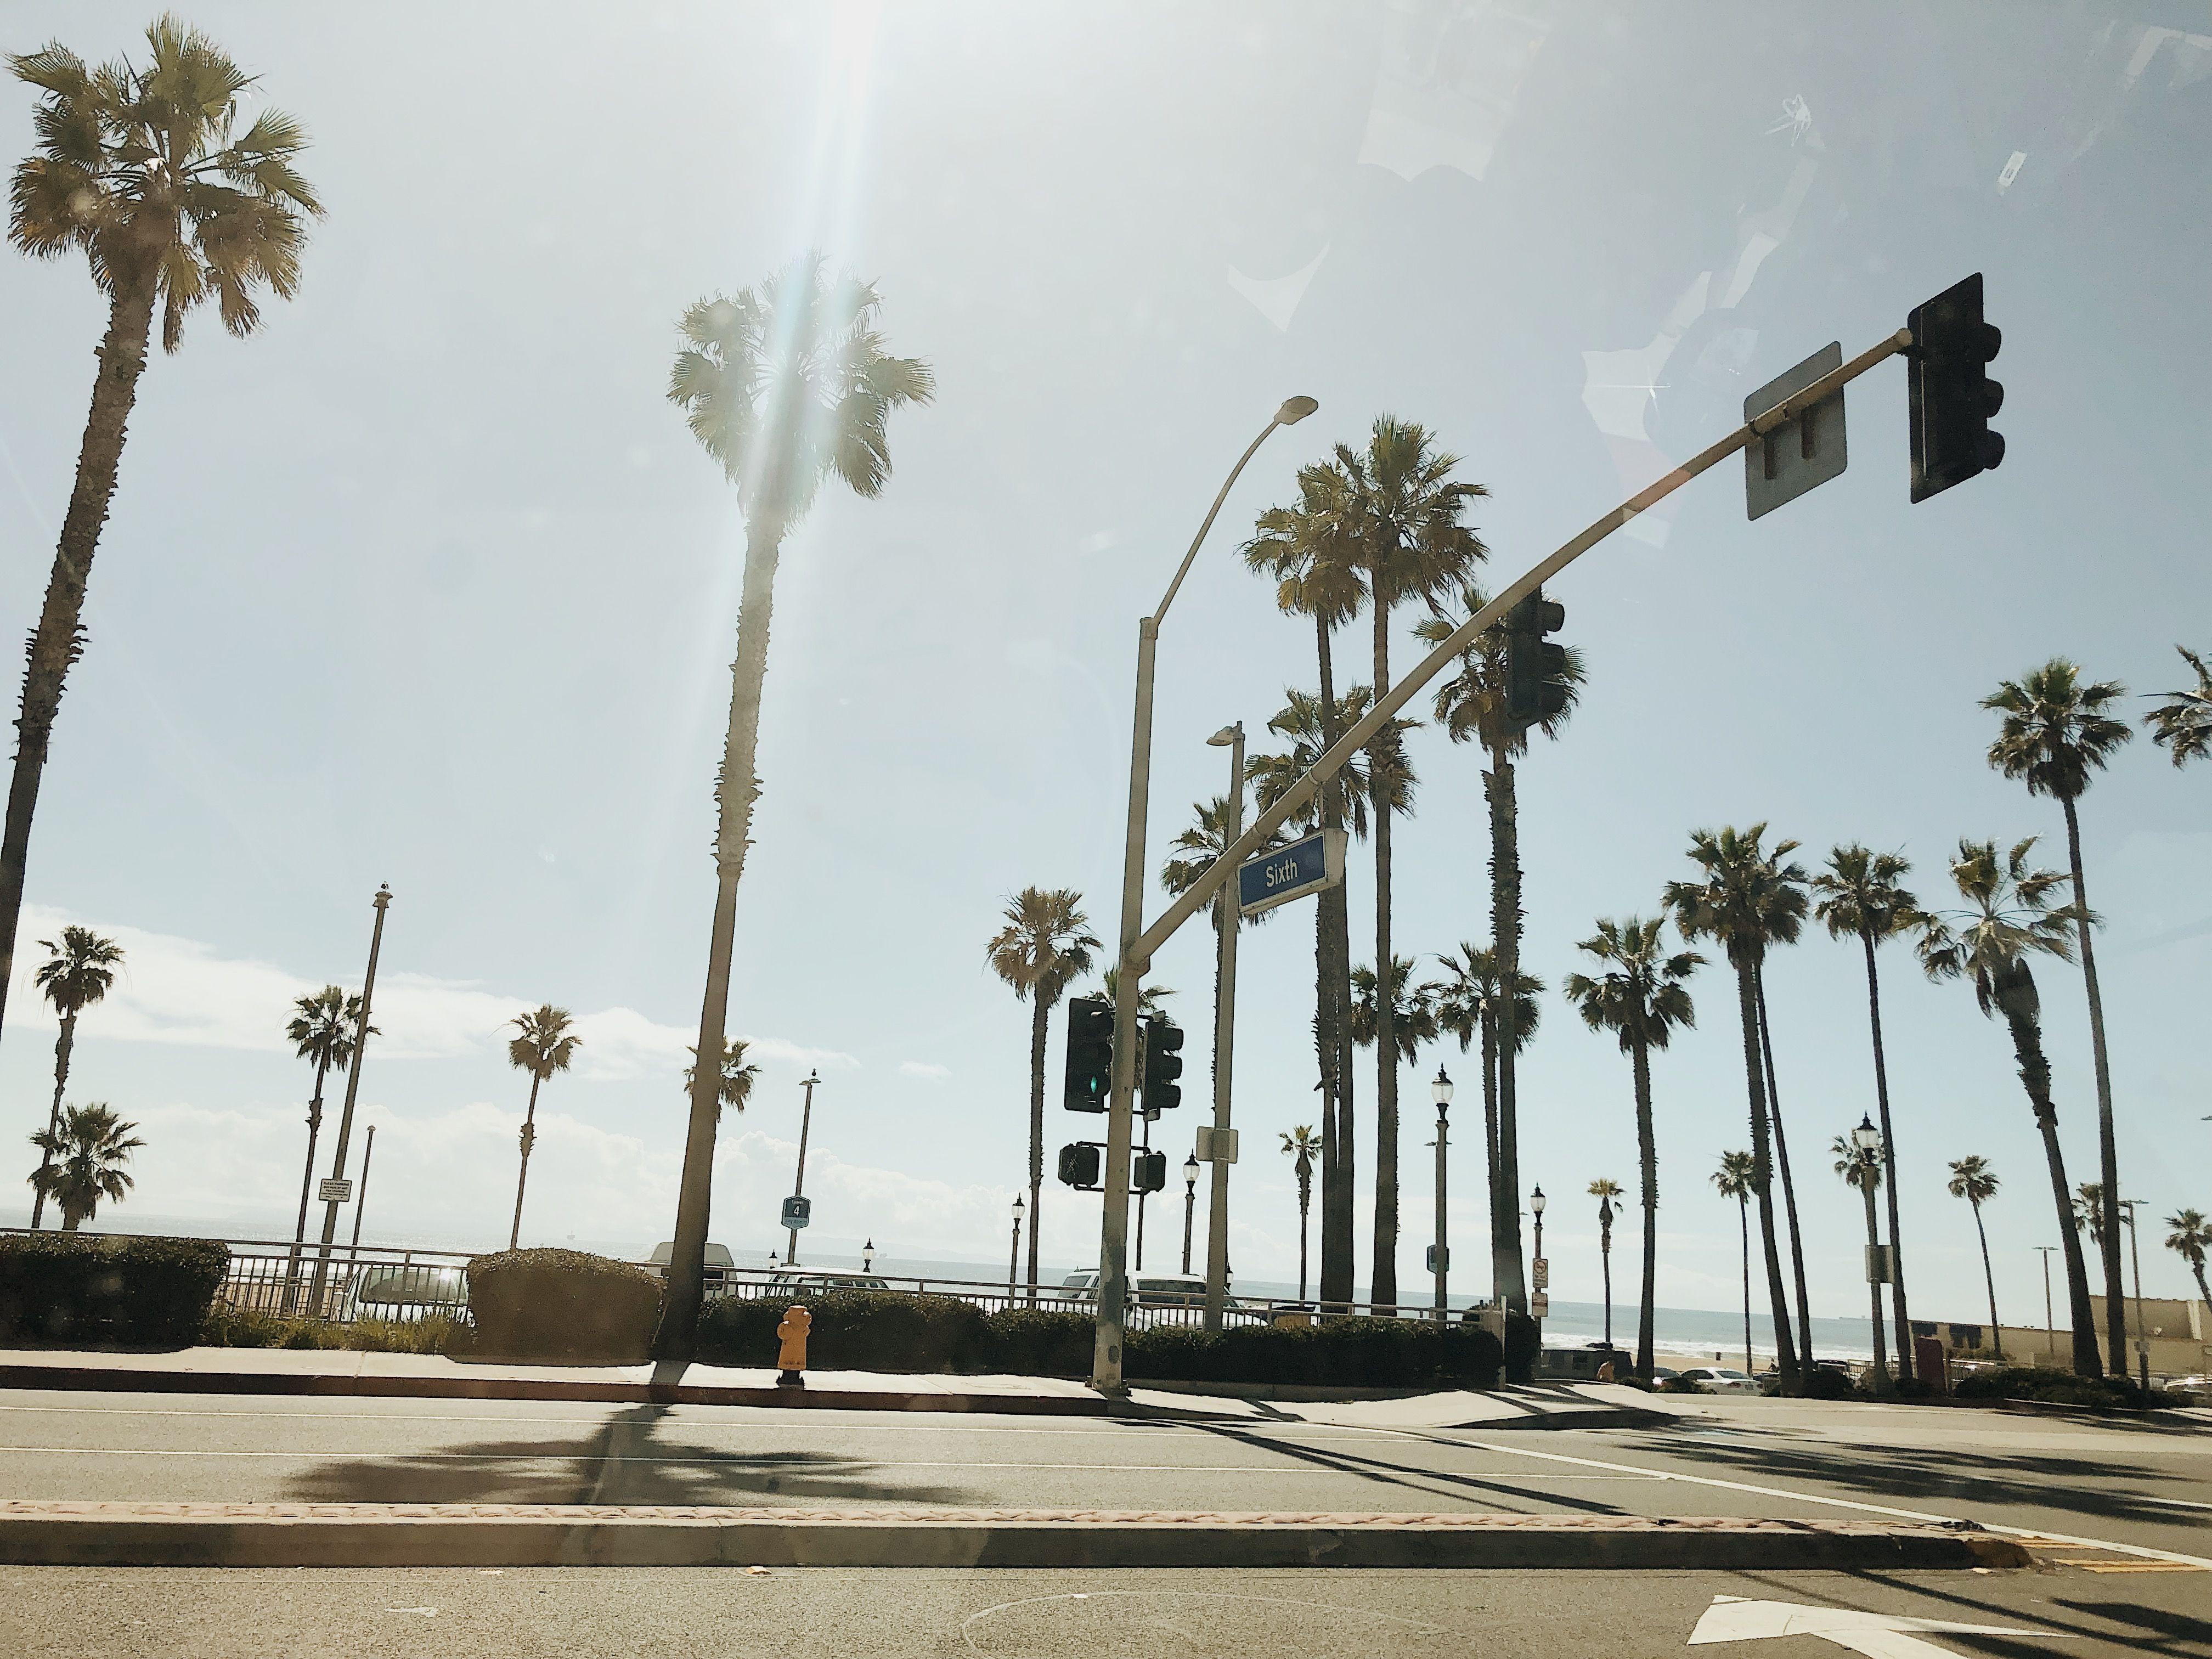 santamonicabeach california palmtress springbreak